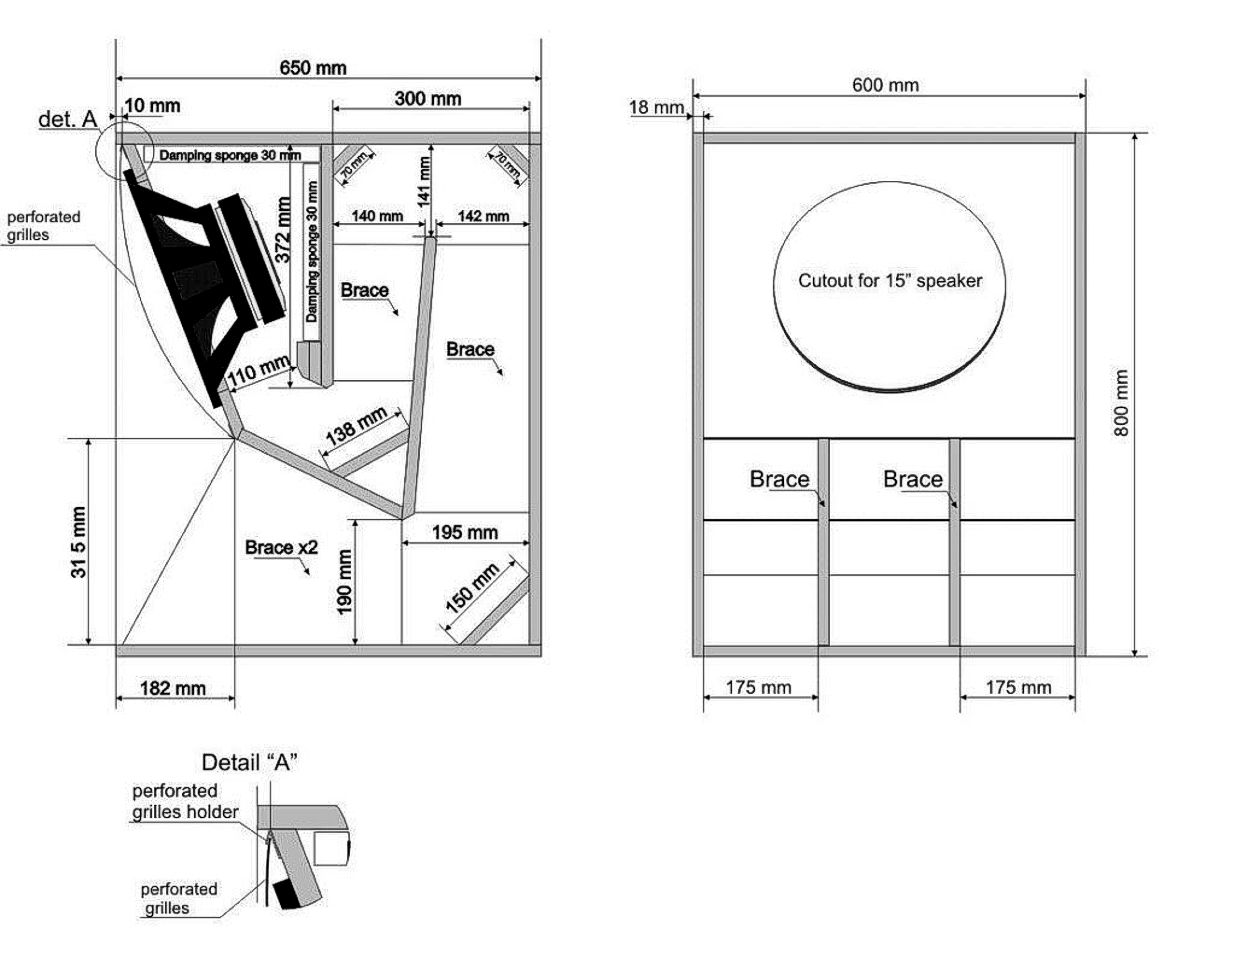 Pin By Miguel Delgallego Quintero On Speakers Design Plans Speaker Plans Subwoofer Box Design Box Design